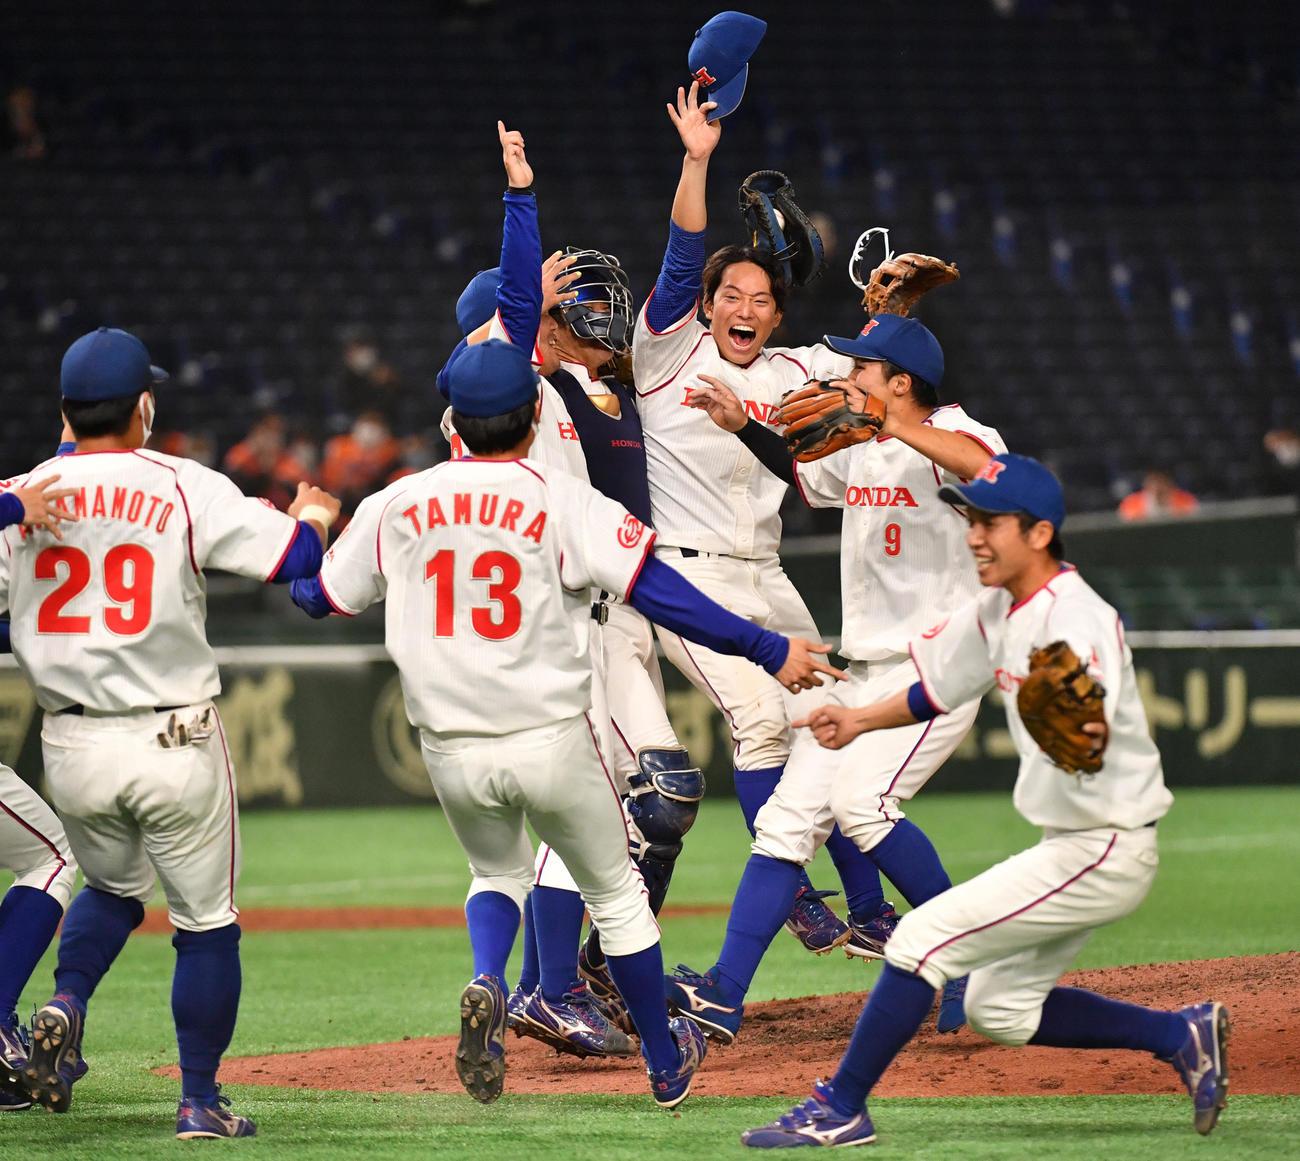 NTT東日本対ホンダ 優勝したホンダナインは歓喜の輪を作る(撮影・柴田隆二)